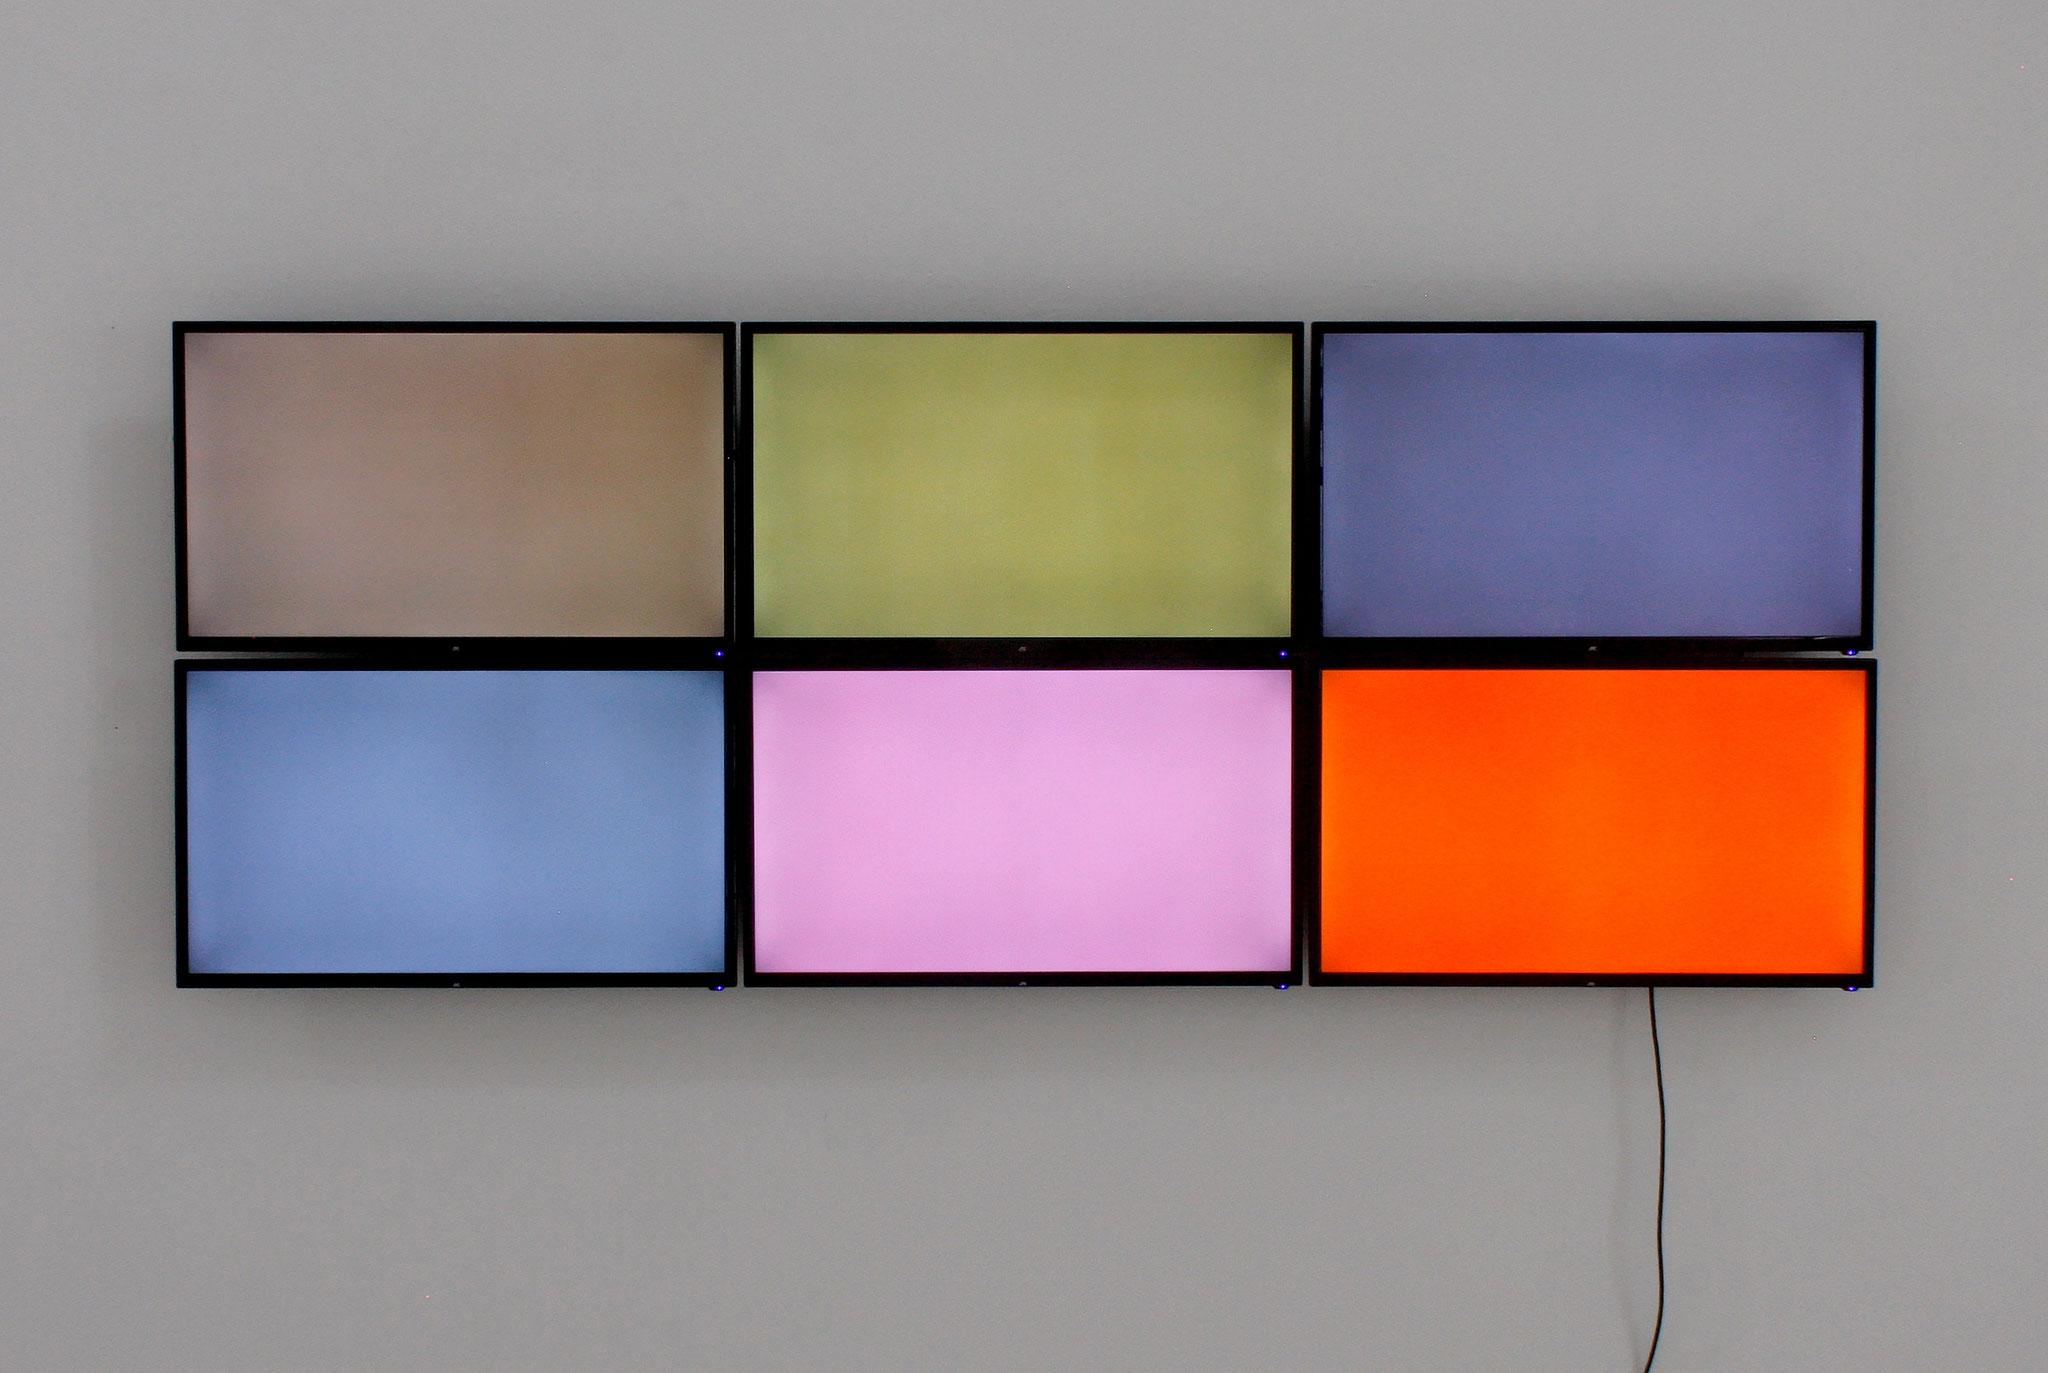 Daniel Schörnig  REFLEXION II  2021  |  6 monitors  wall installation  video  145 min